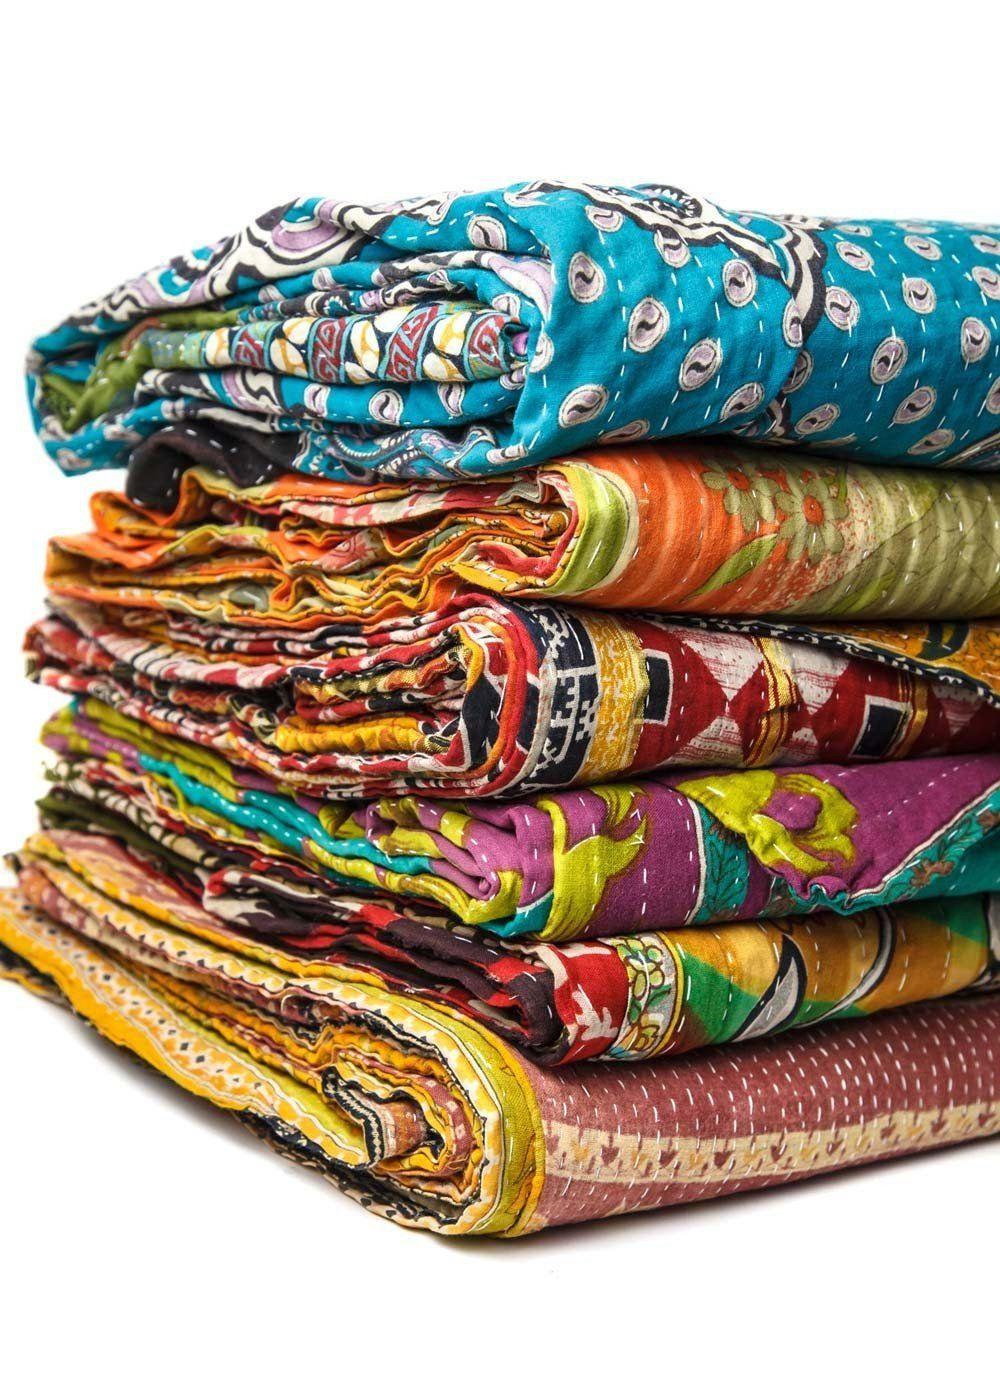 Kantha Blanket Wholesale Fair Trade Kantha Throw Wholsale Indian Kantha Quilt Vintage Kantha Vintage Kantha Quilts Kantha Quilt